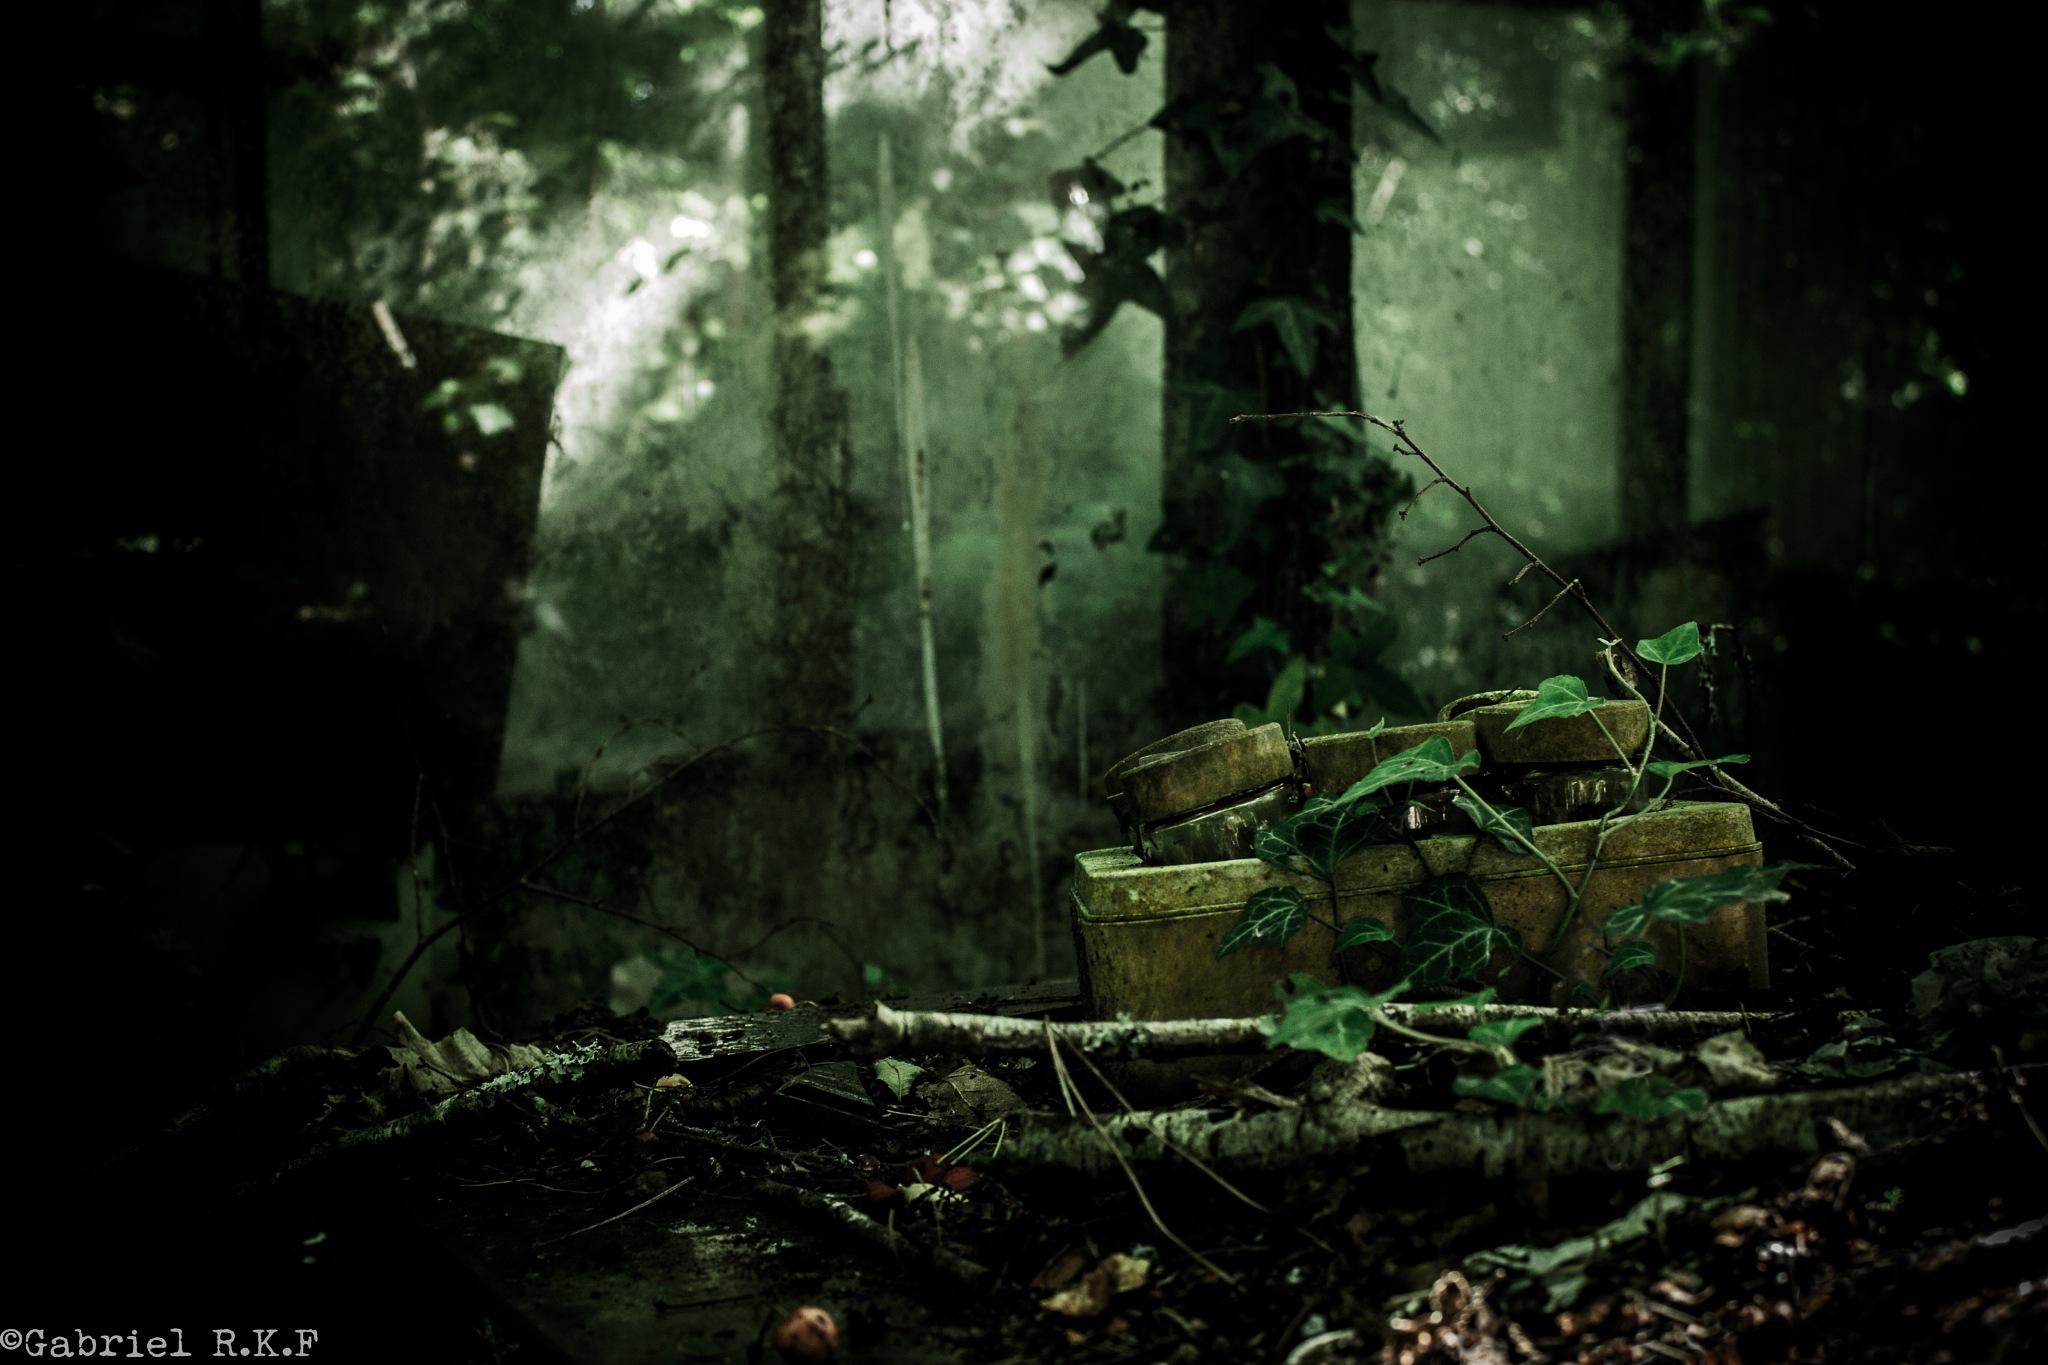 Decaying Fast... by GabrielR.K.F